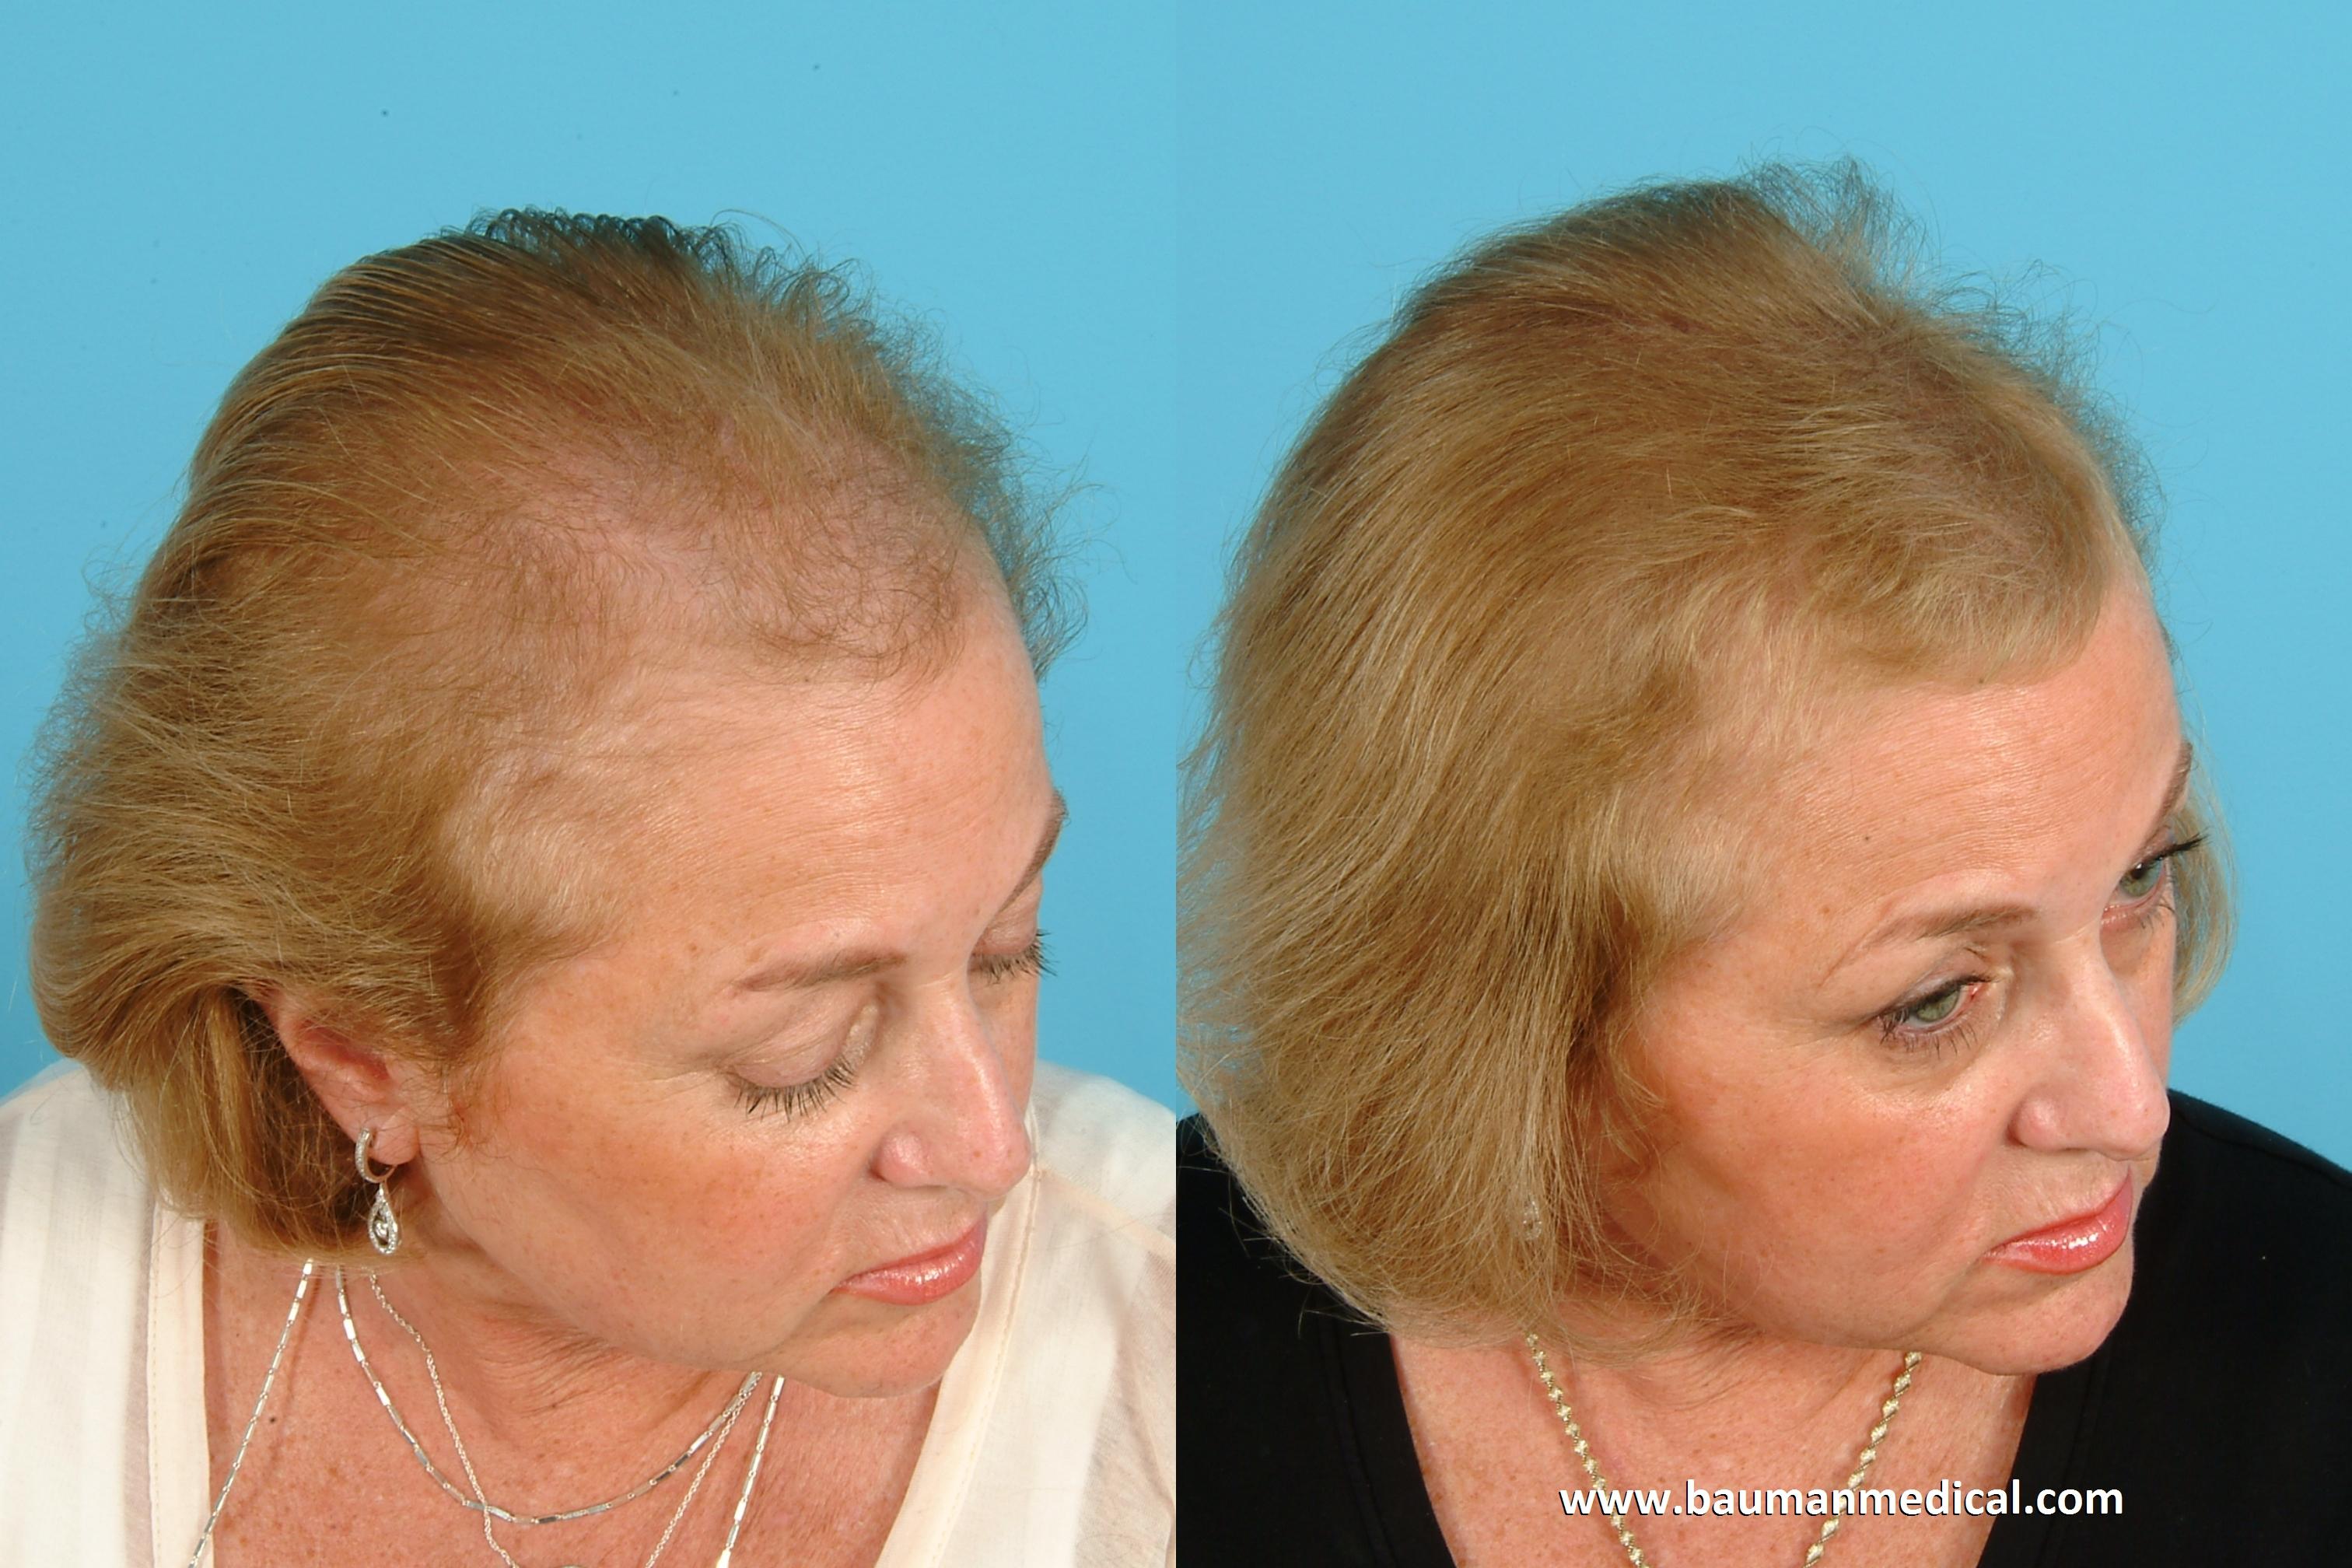 Dutasteride uk hair loss.doc - Lasertherapy_frontal Male_6mos Lasertherapy_frontal Male_6mos